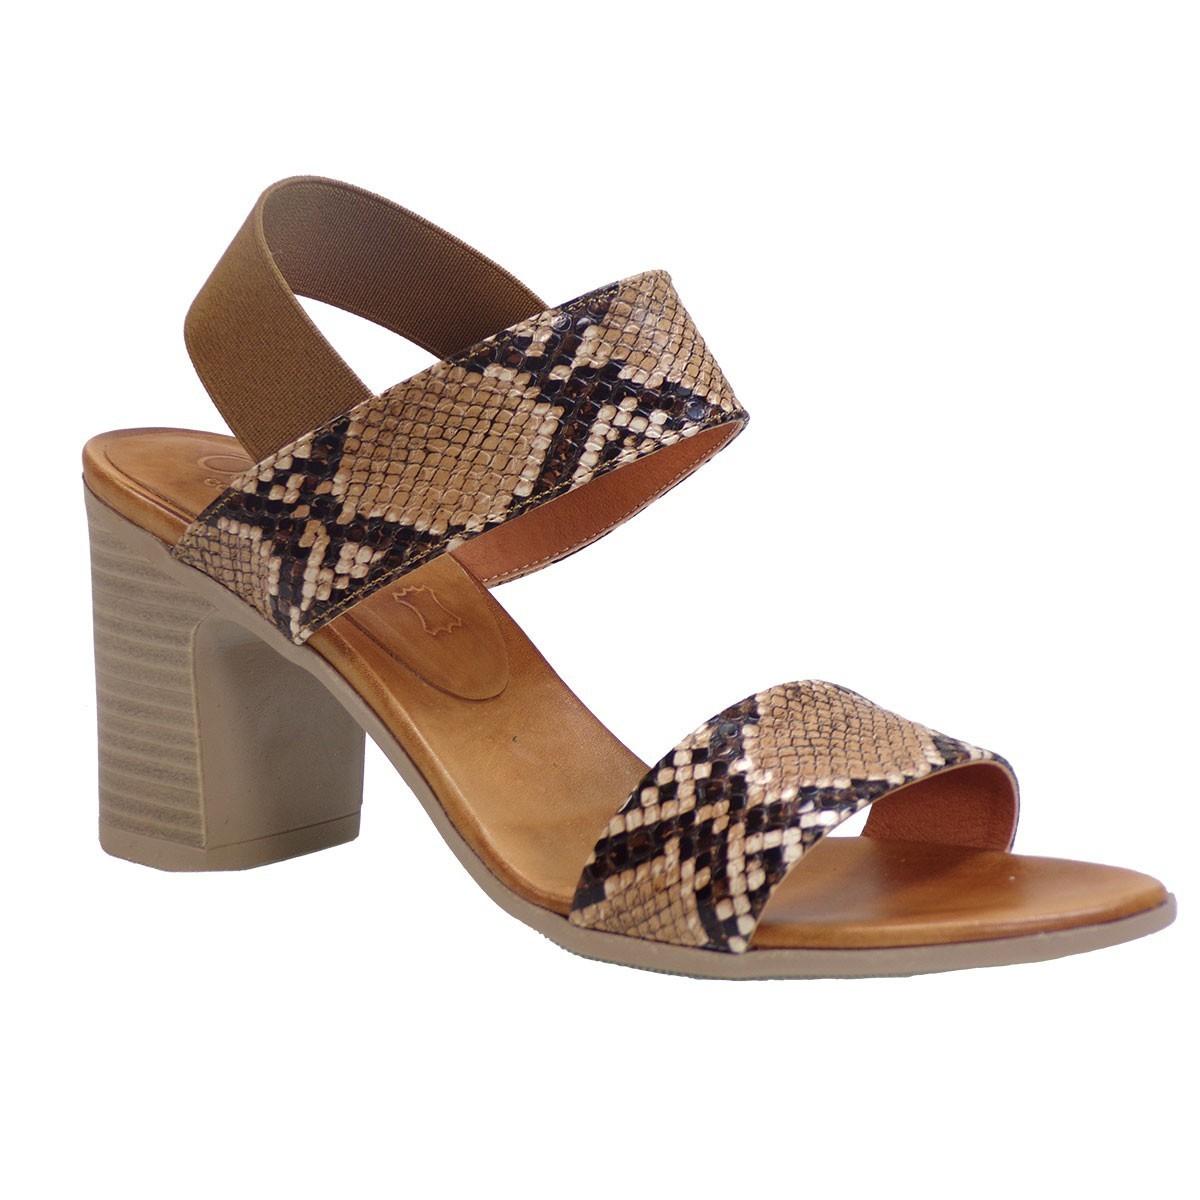 Katia Shoes Anneto Γυναικεία Πέδιλα 74-40 Ταμπά Φίδι